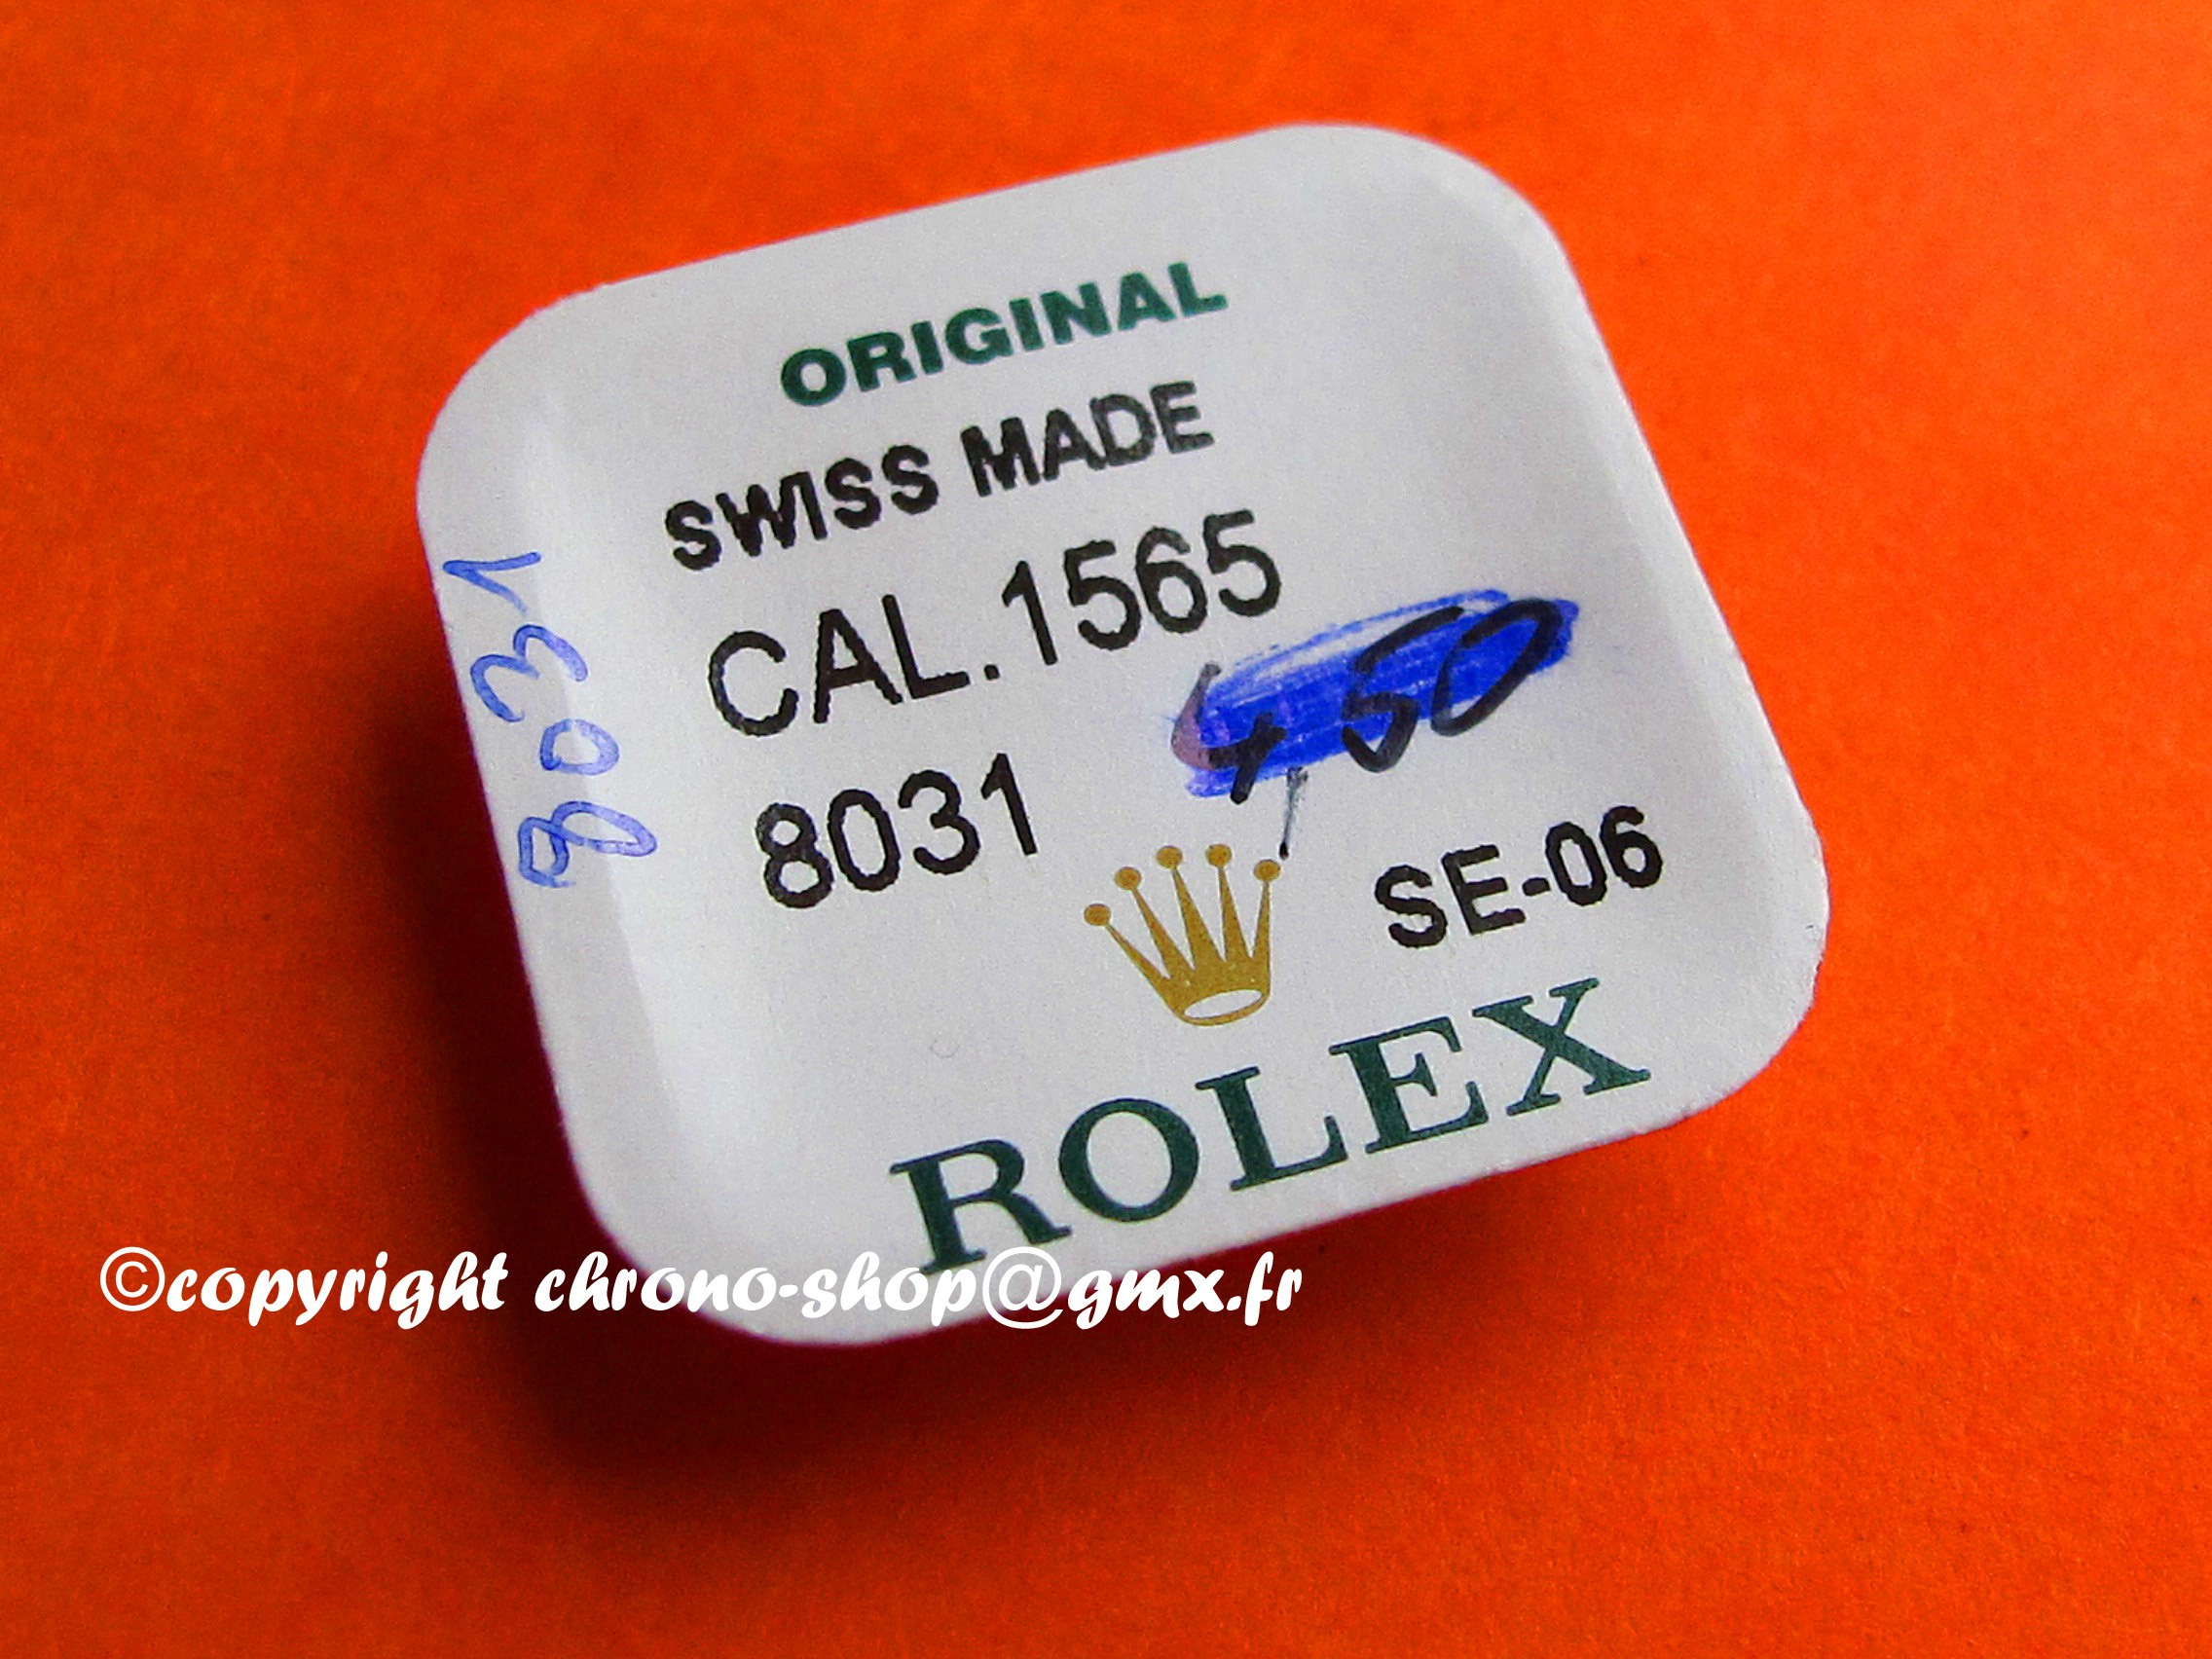 ROLEX CALIBER 1565  PAR ref--8031--